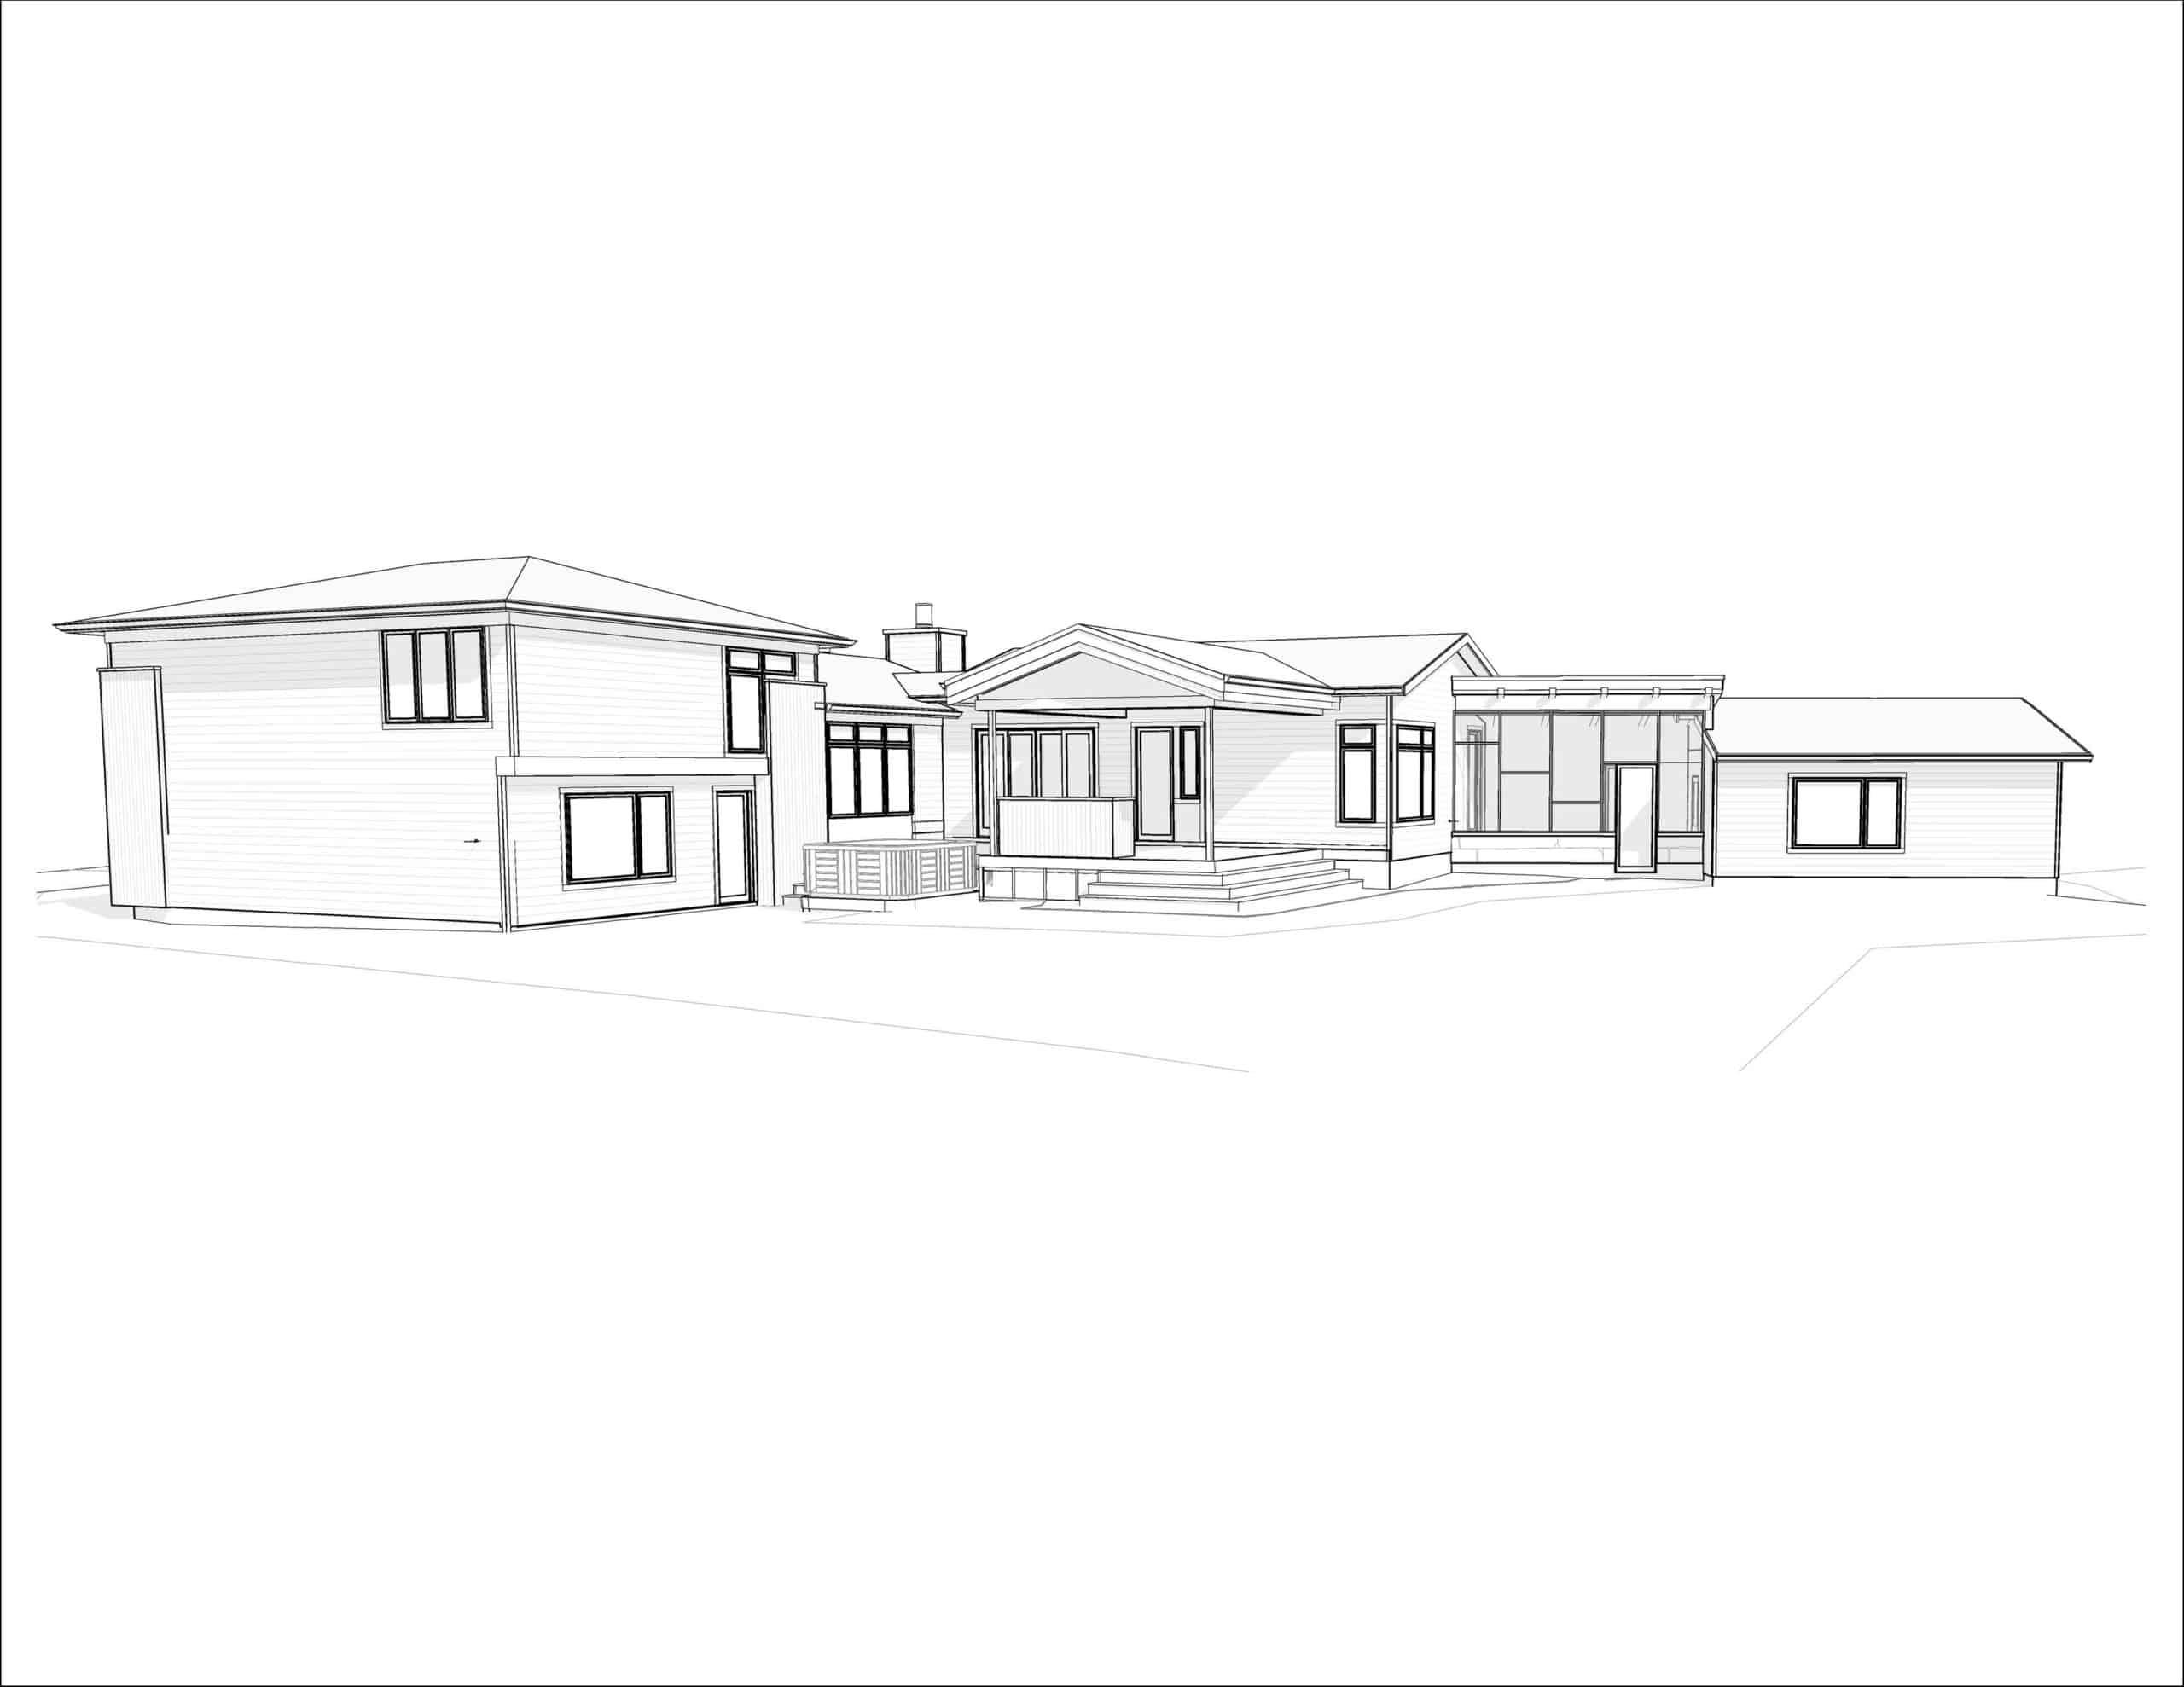 Lawson Place - Modern Renovation rear perspective design